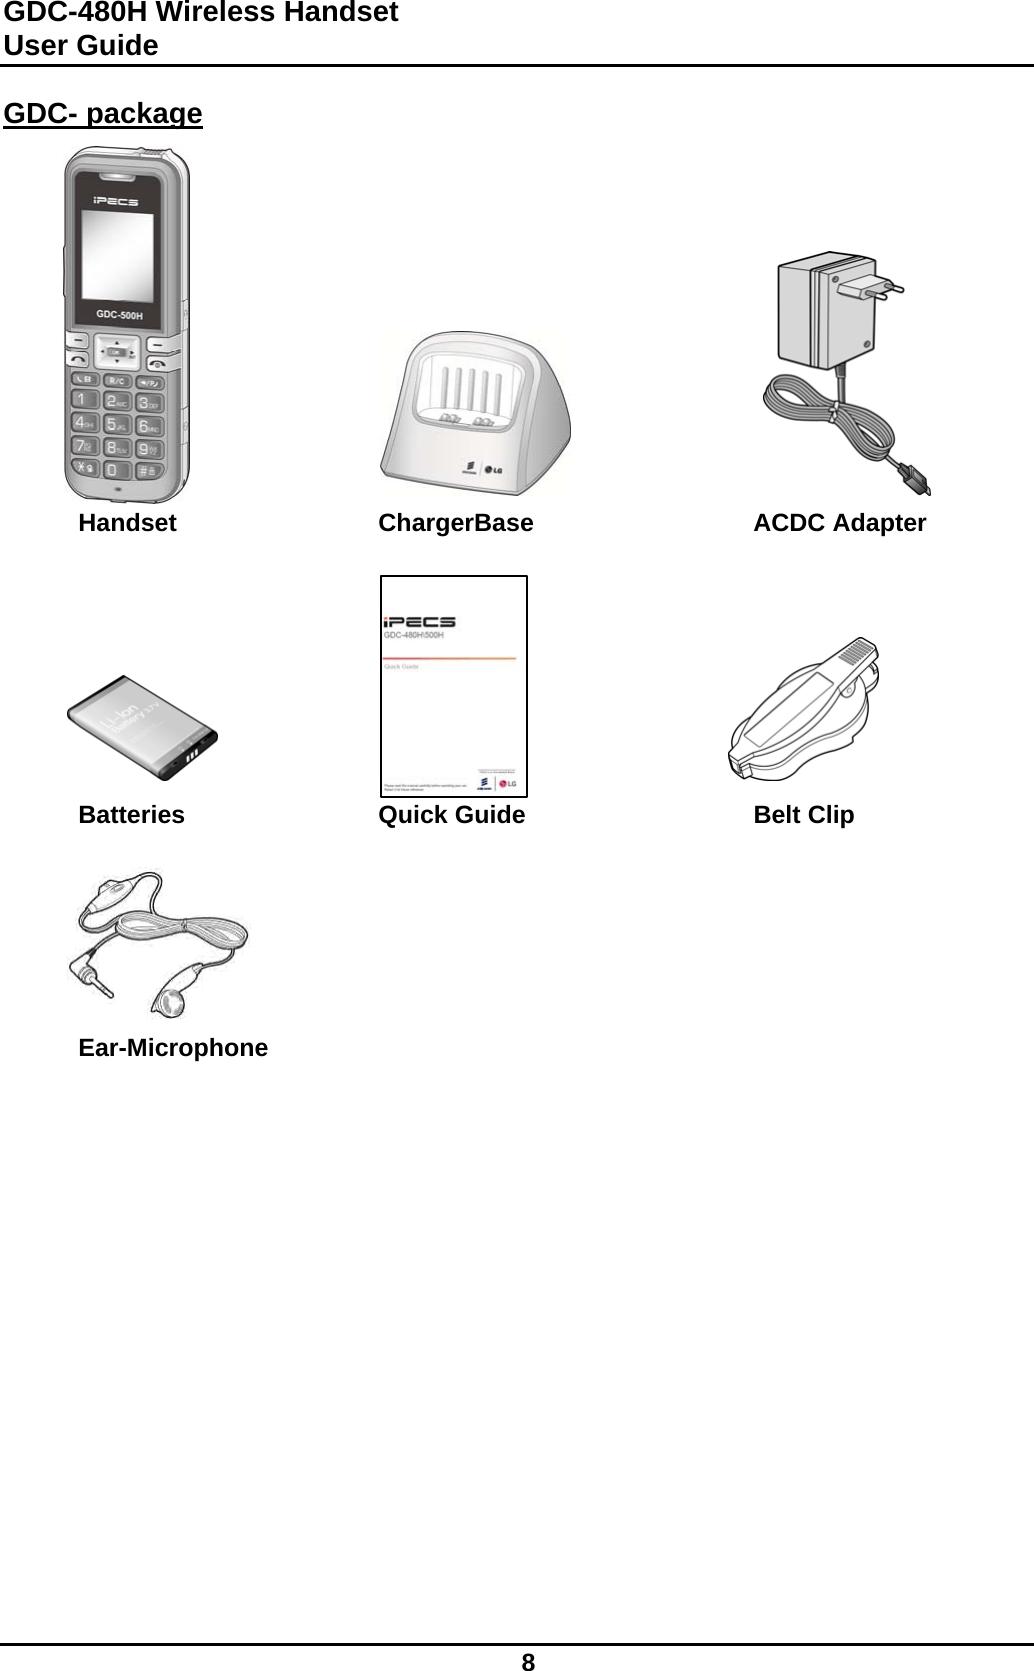 Ericsson LG Enterprise GDC-480H Wireless Handy Telephone